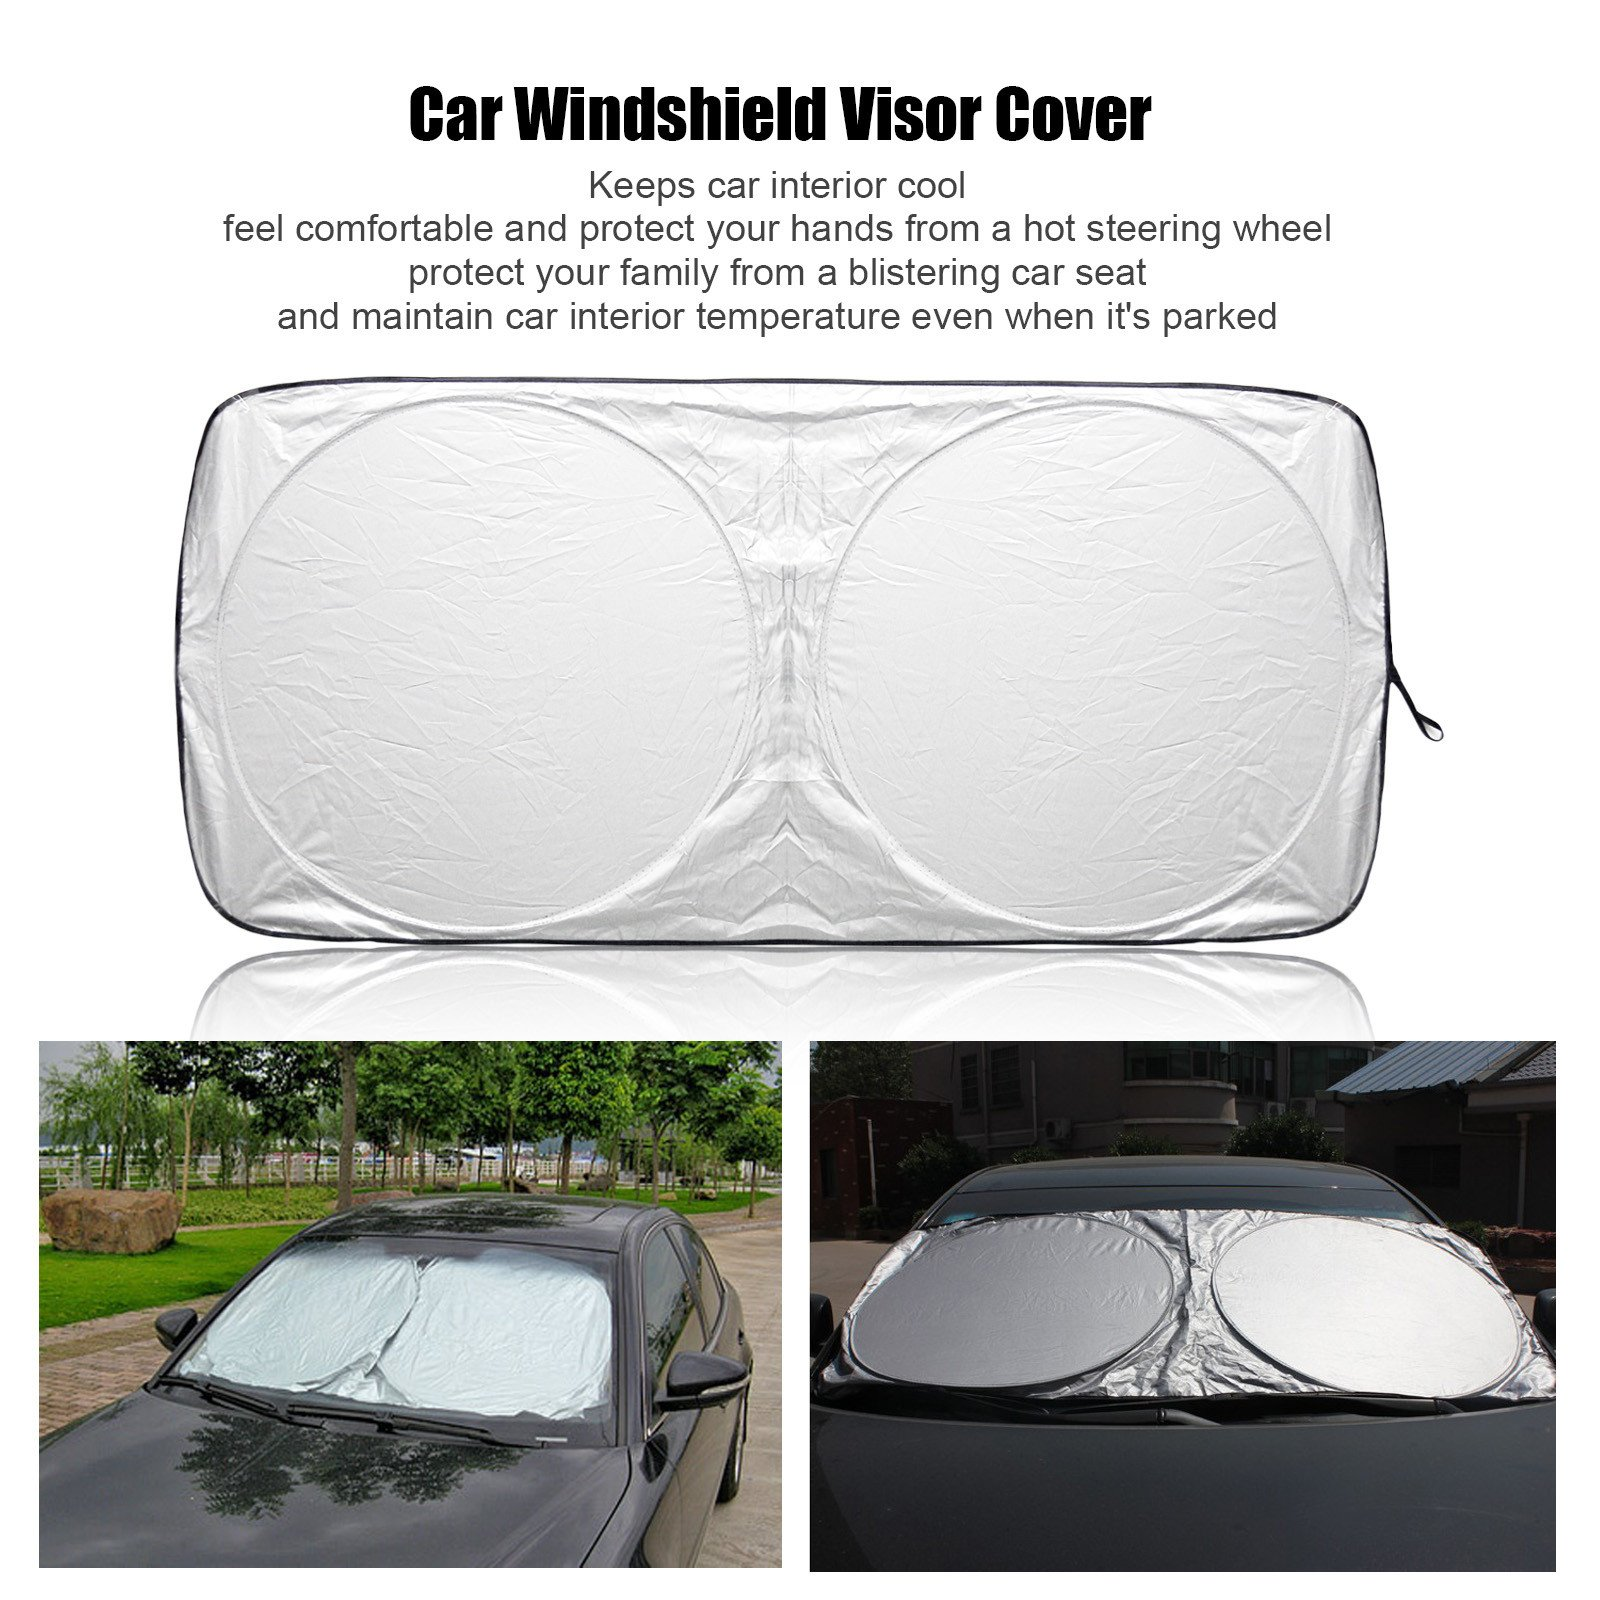 Auto Front Rear Window Sun Shade Car Windshield Visor Cover Block